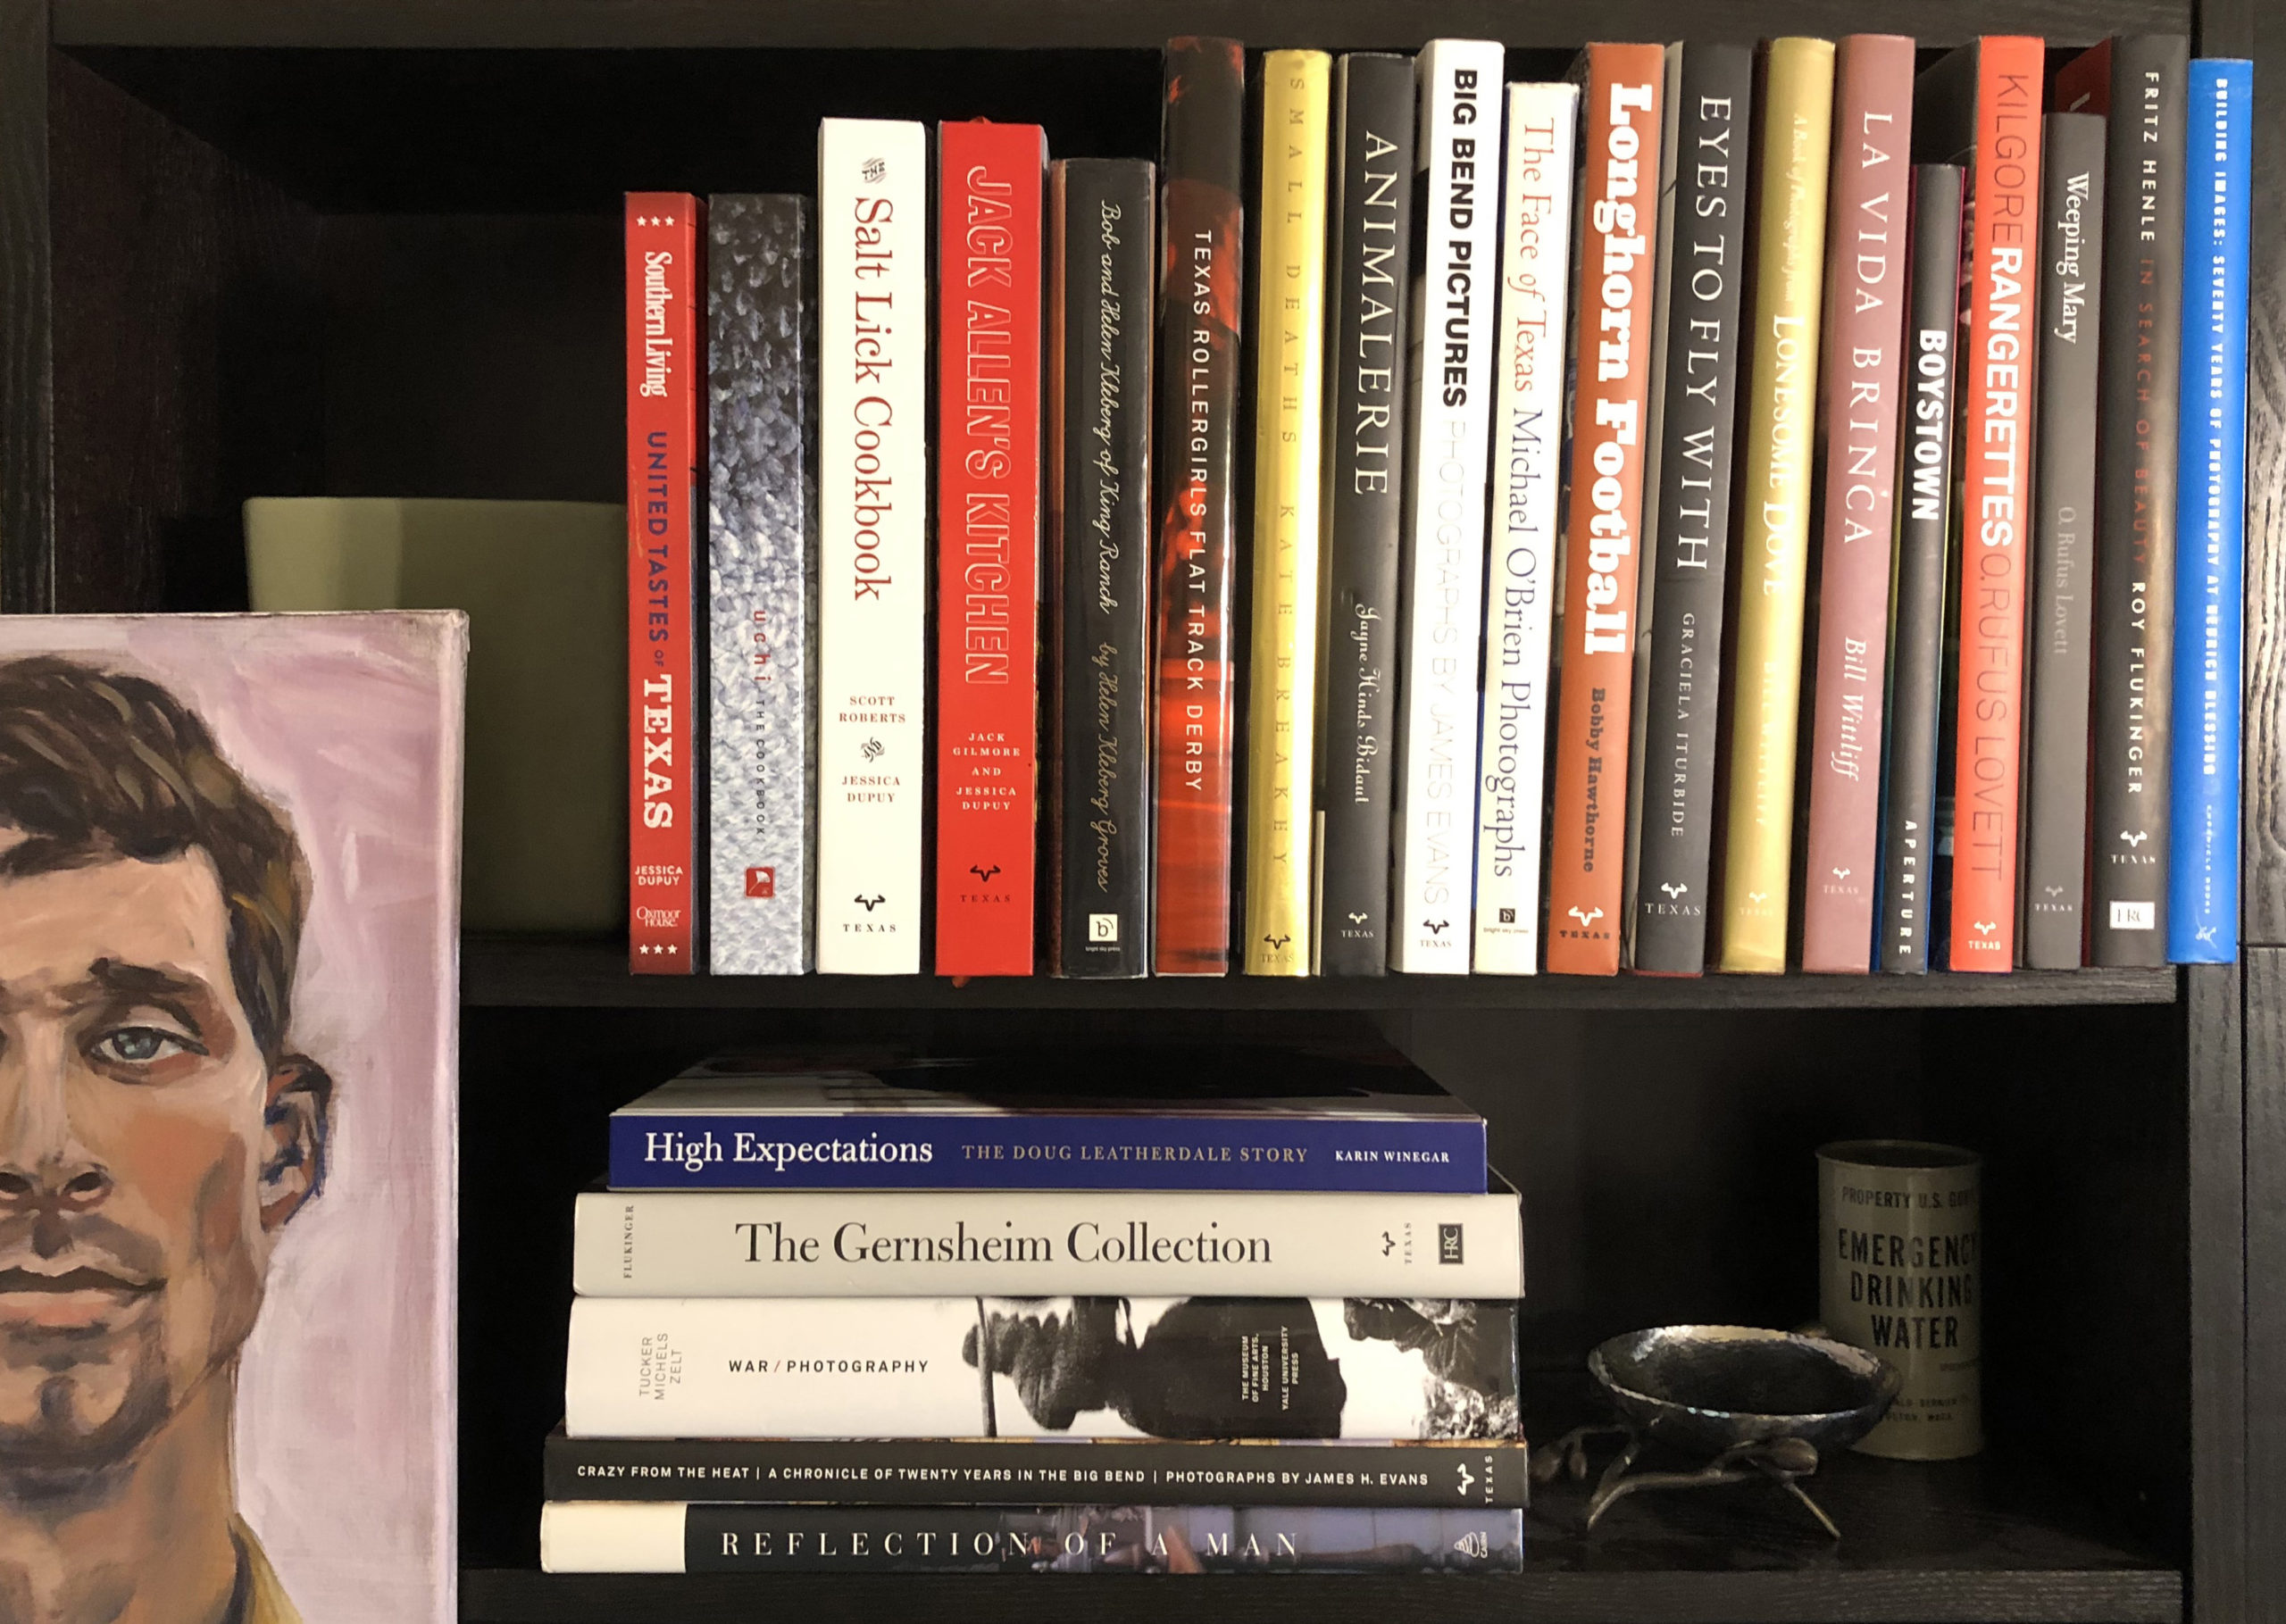 Bookshelfed